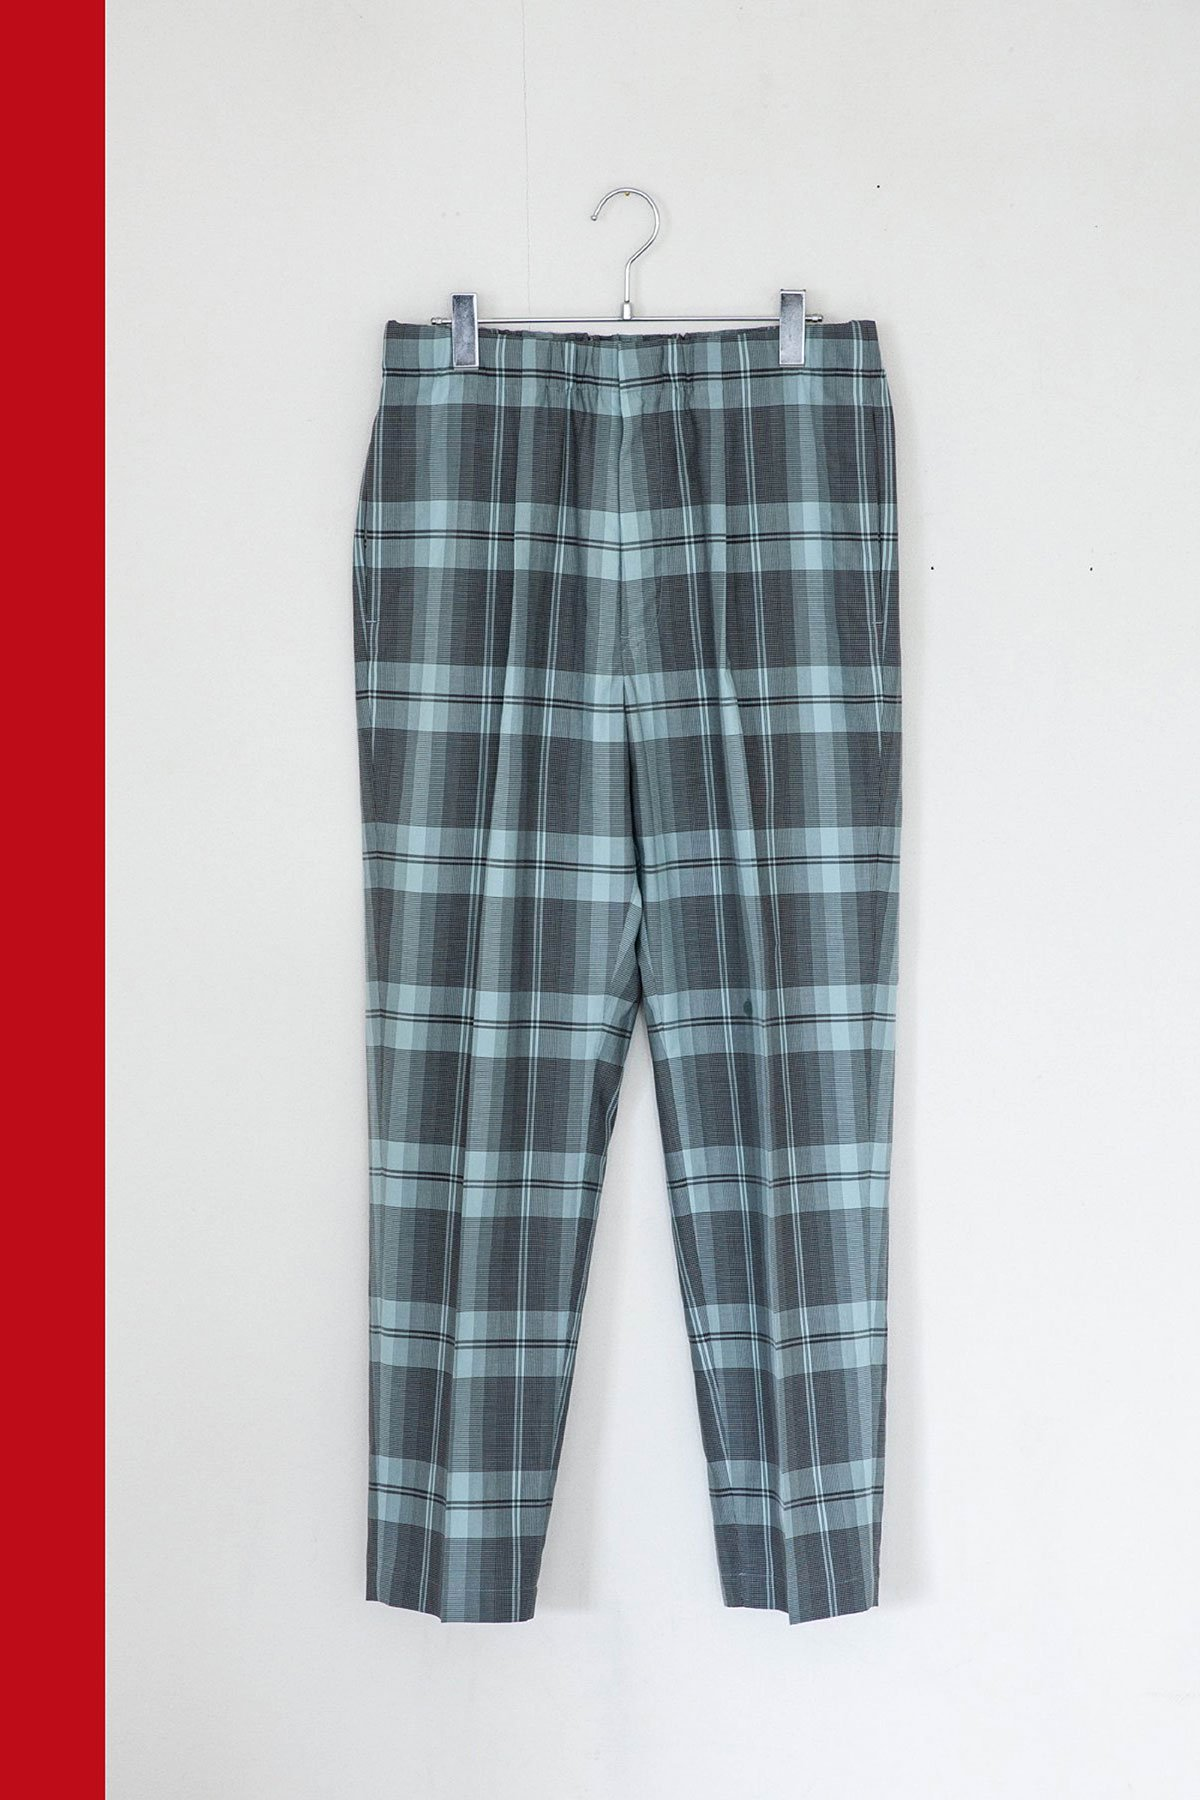 WELLDER / Drawstring Trousers